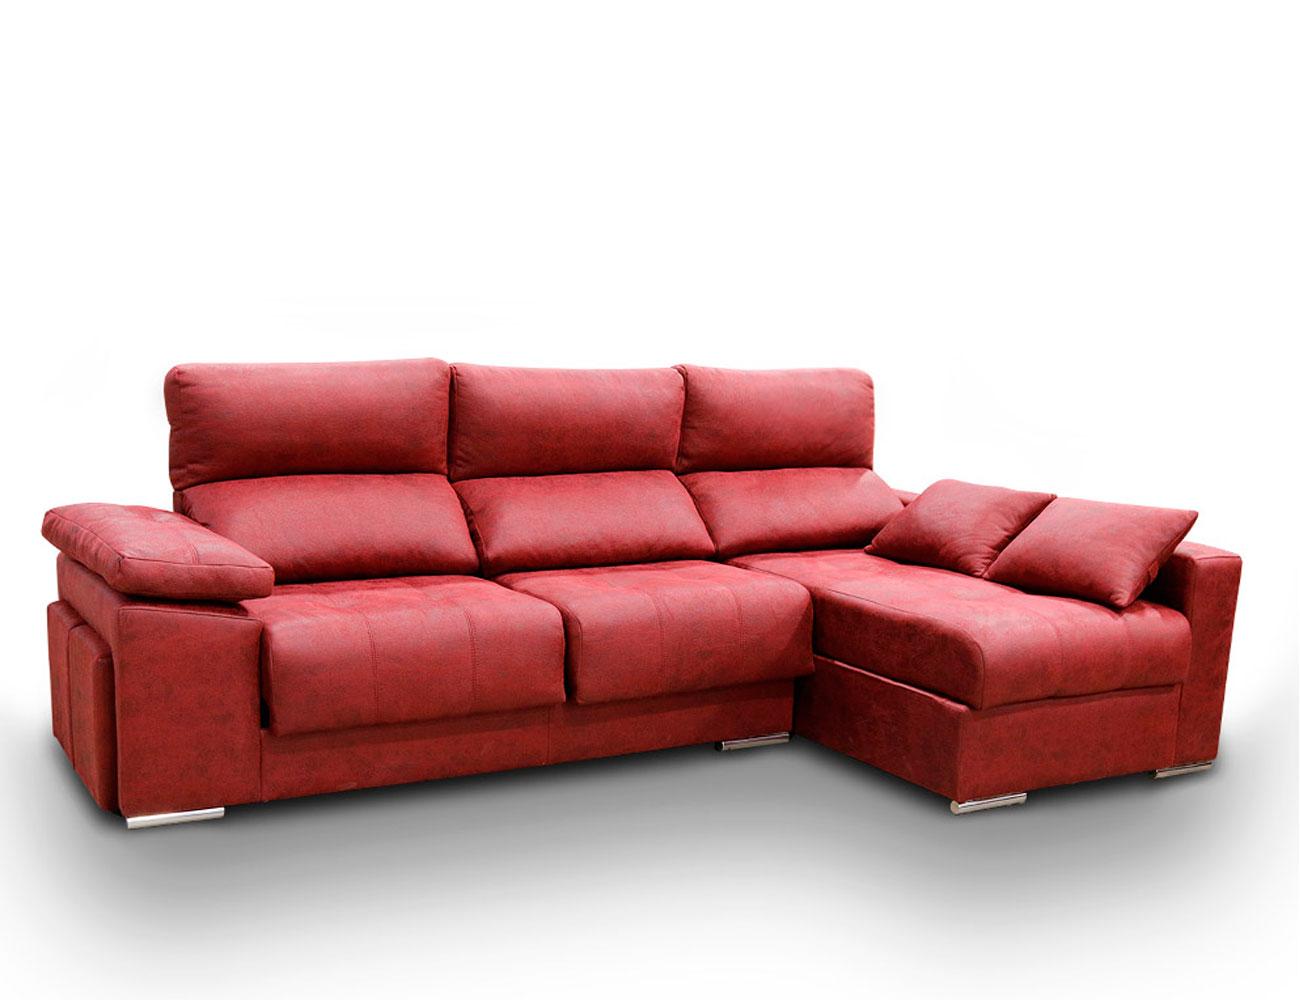 Sofa chaiselongue anti manchas rojo granate9